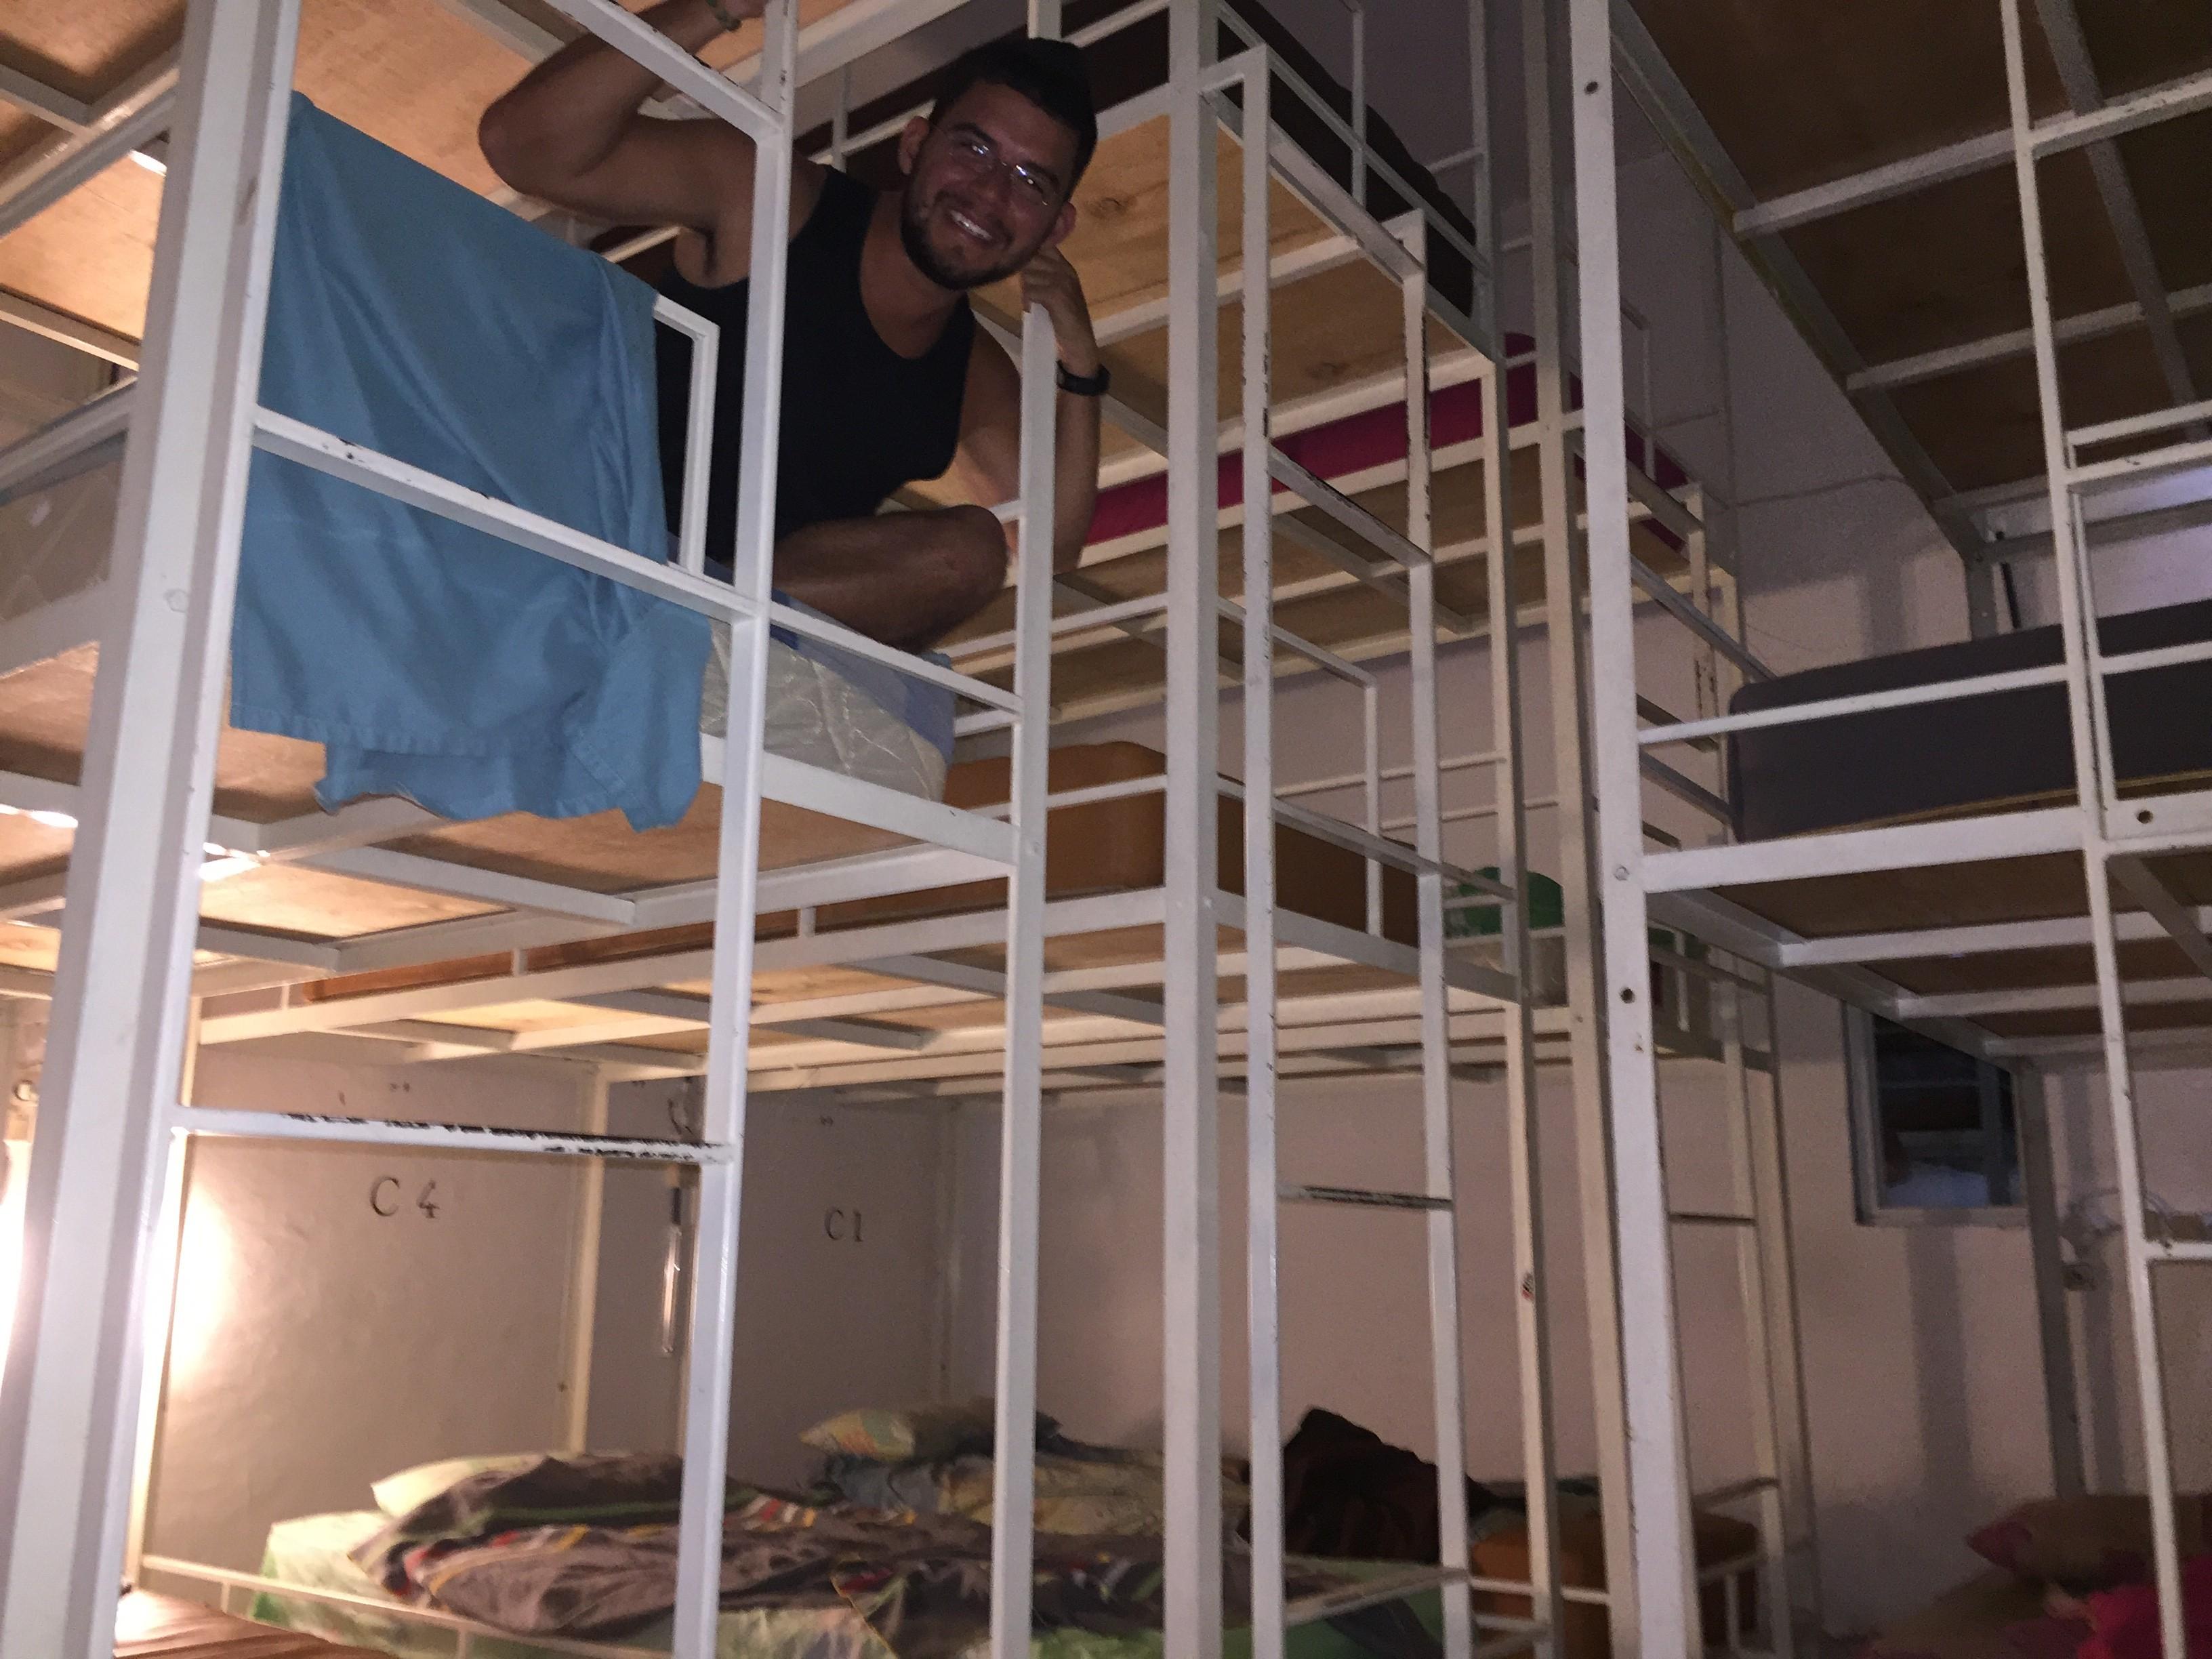 Hostel Dorm Life